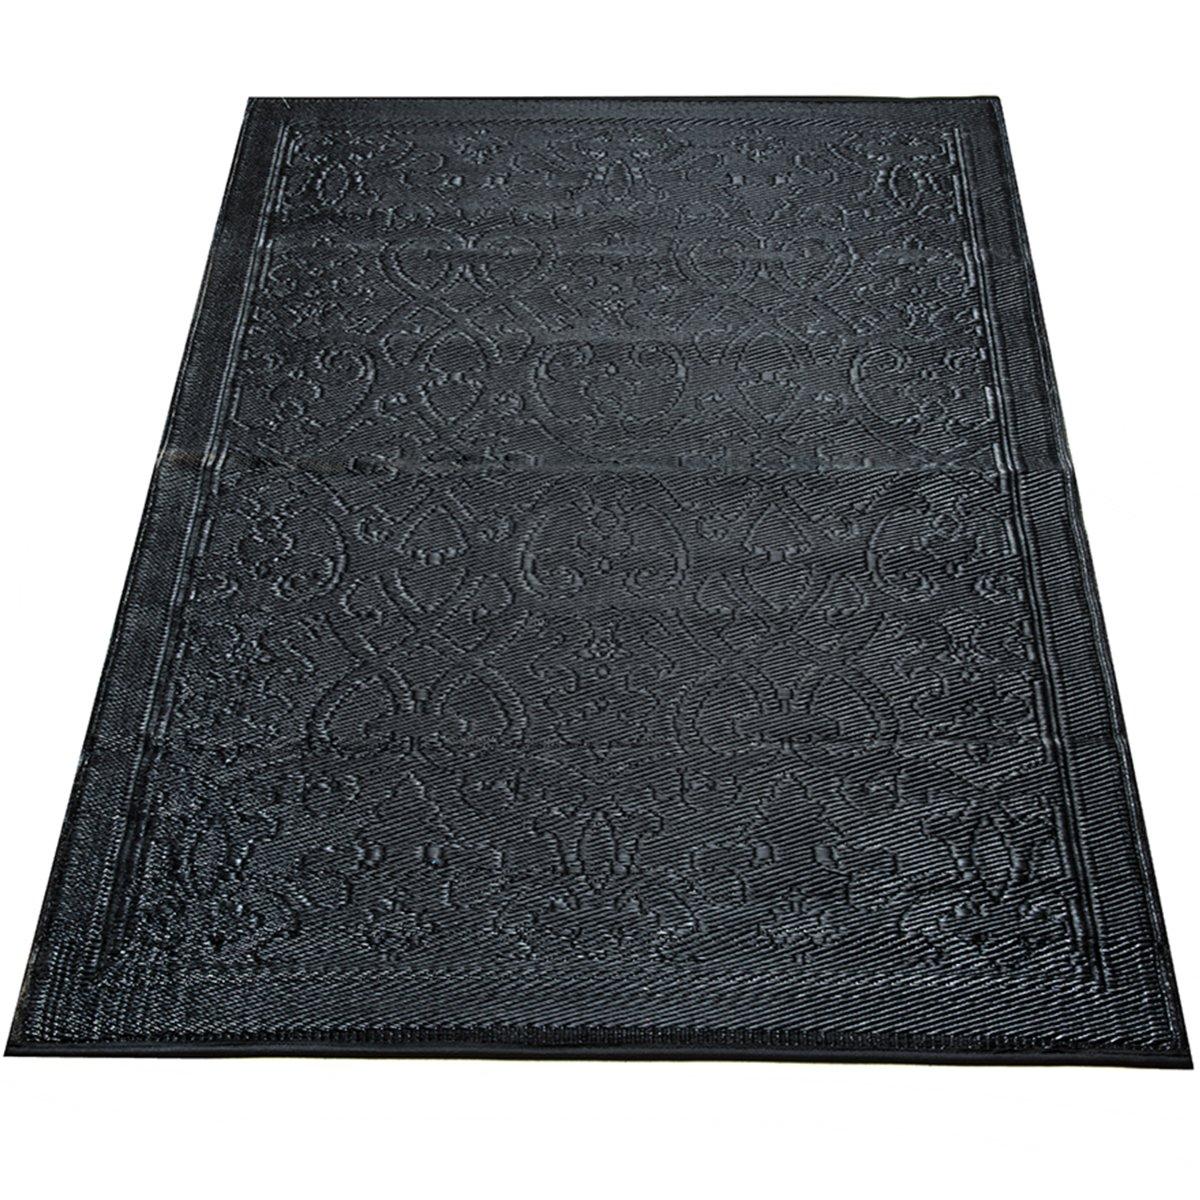 Yankee Trader 4' X 6' Indoor/Outdoor Decorative Reversible Patio Carpet Rug, Pattern 15